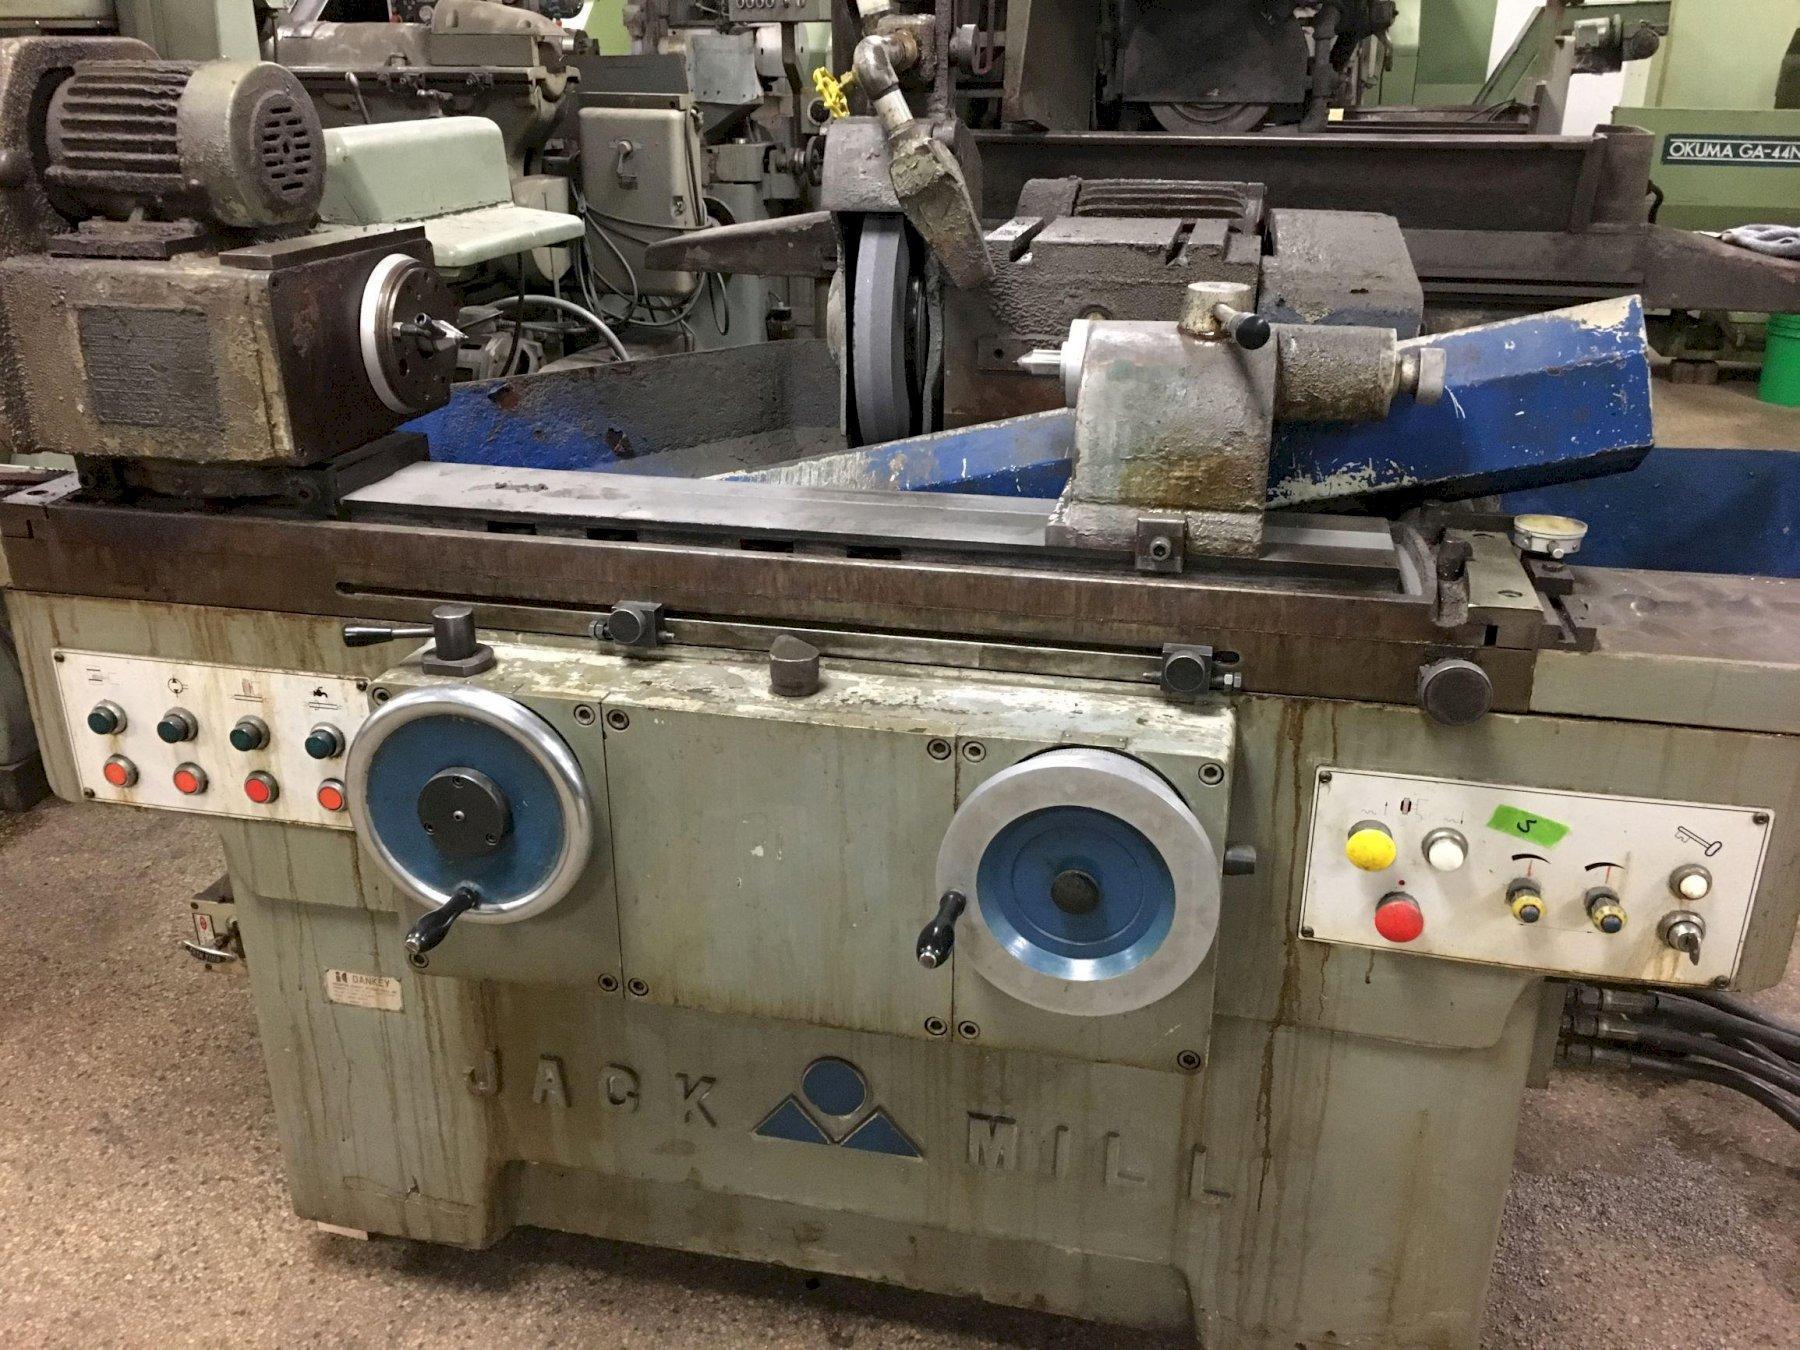 Jack Mill Hydraulic Cylindrical OD Grinder, with Internal Attachment